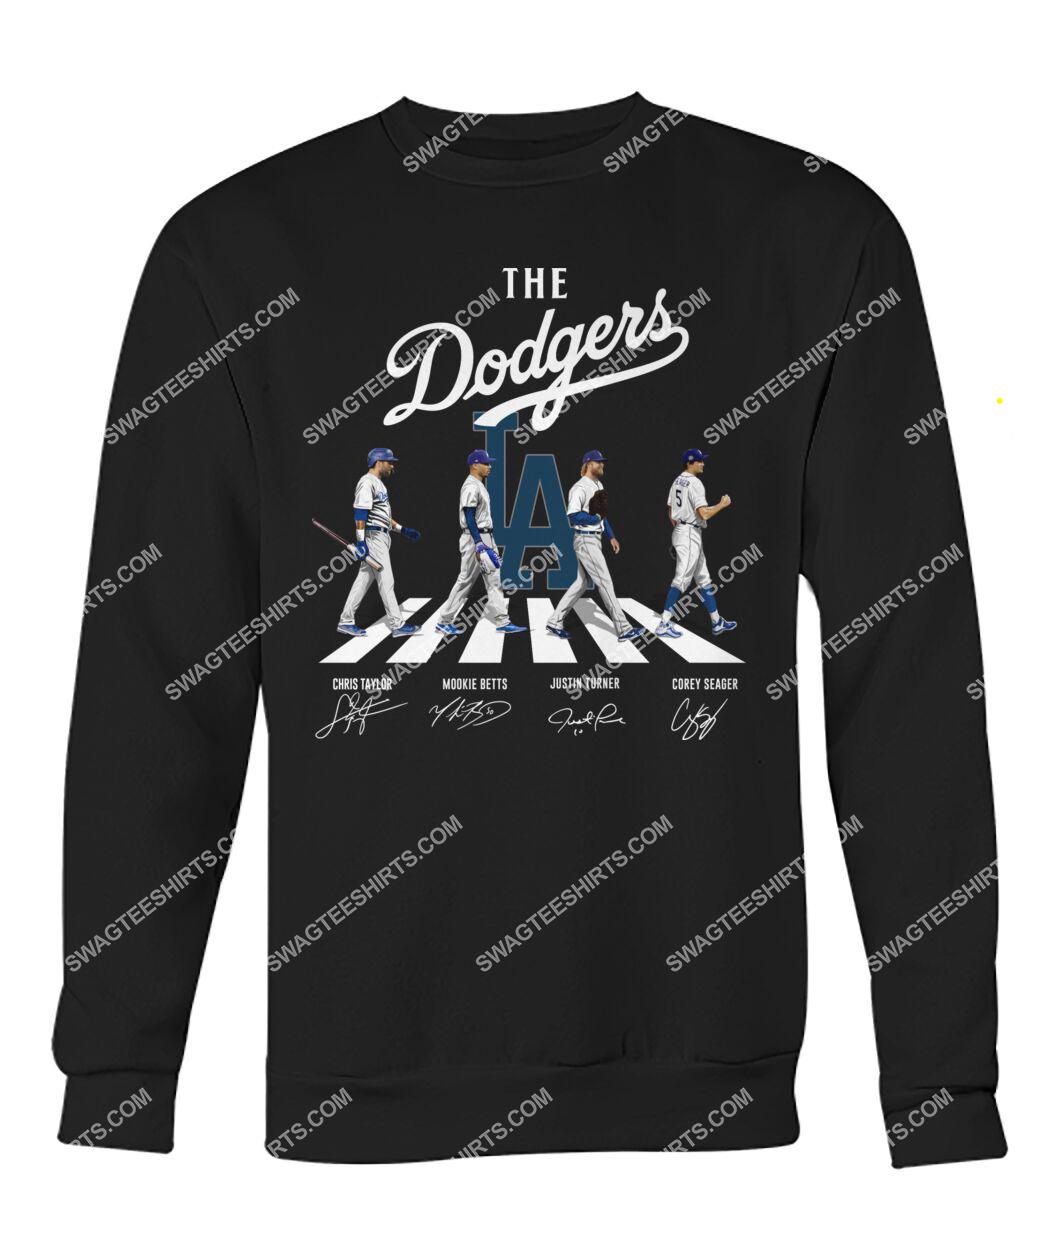 the los angeles dodgers walking abbey road signatures sweatshirt 1